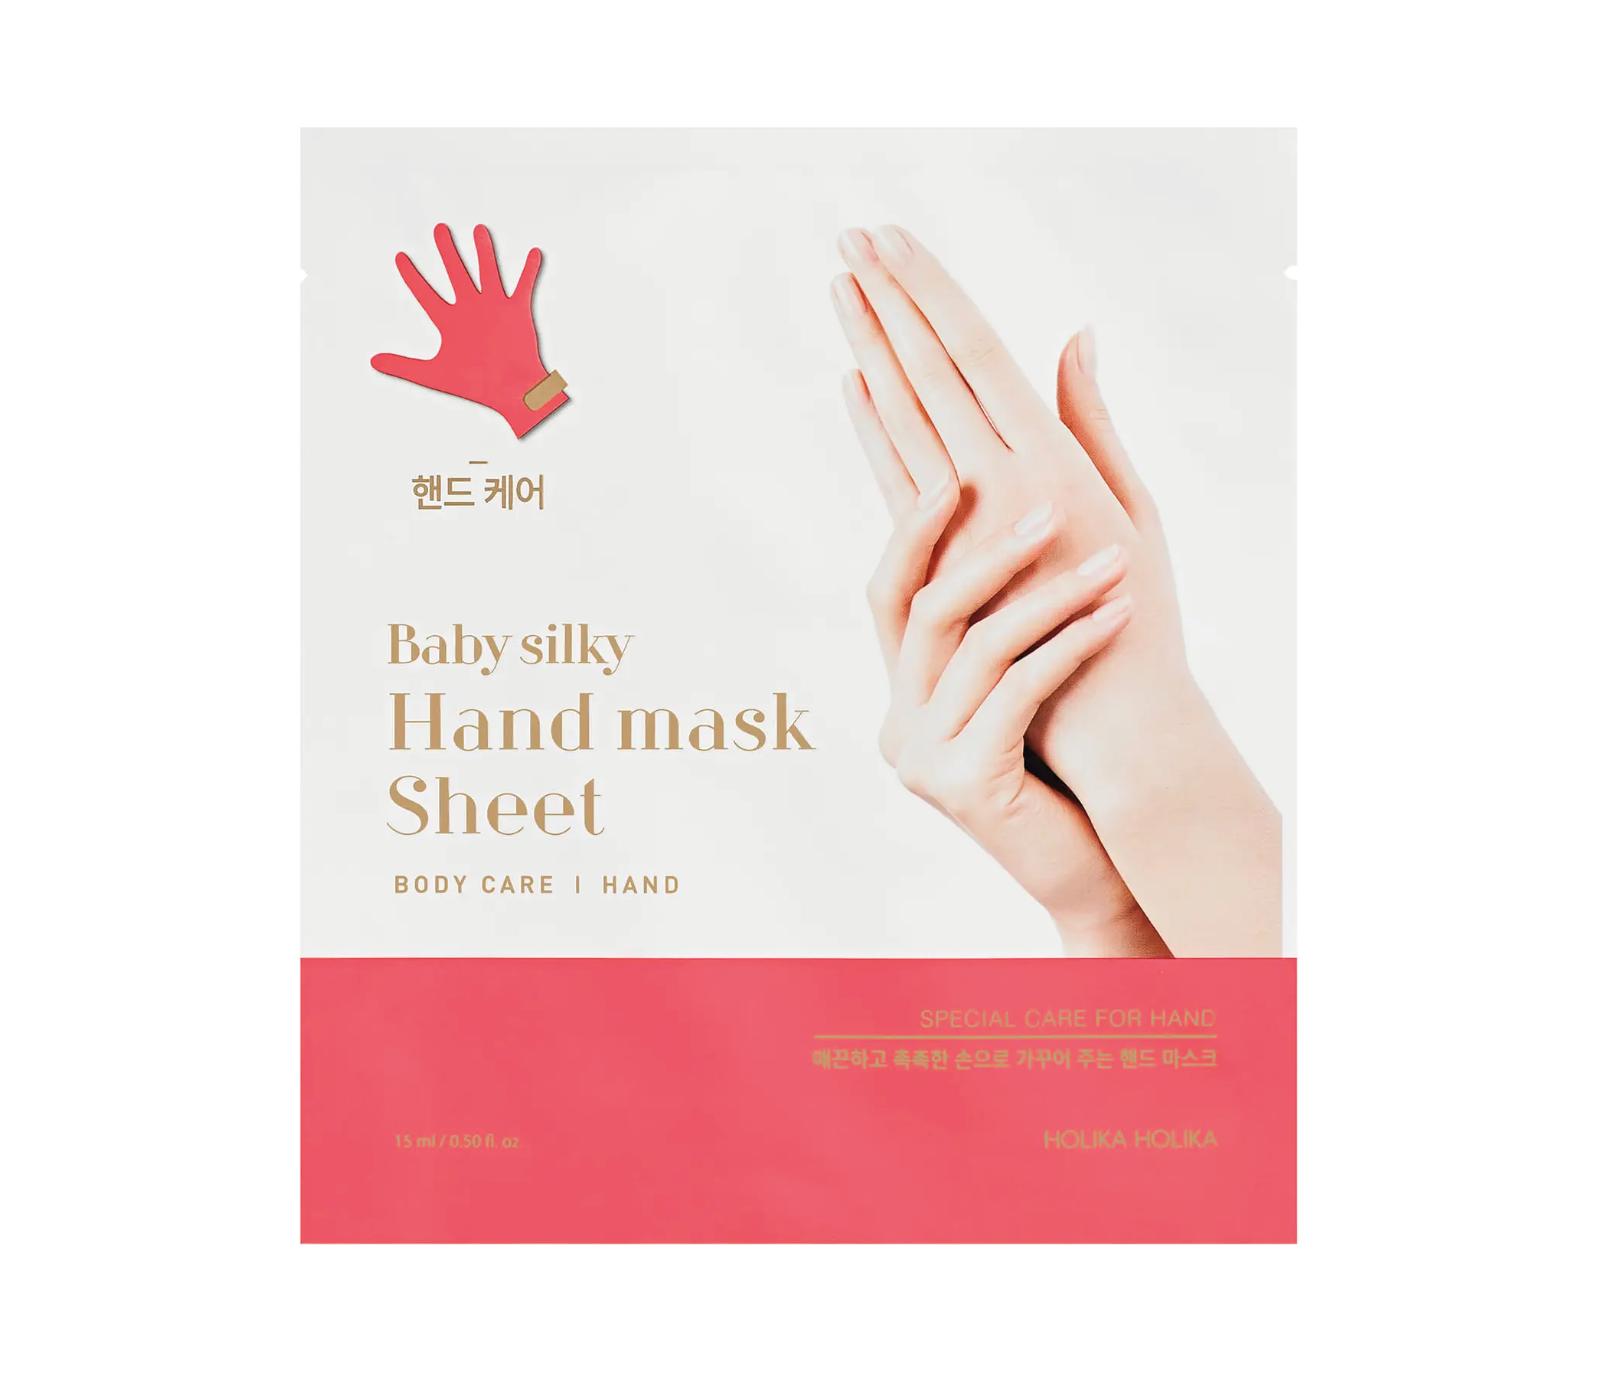 masque-gants-hydratants-mains-holika-holika-hand-mask-sheet-avis-revue